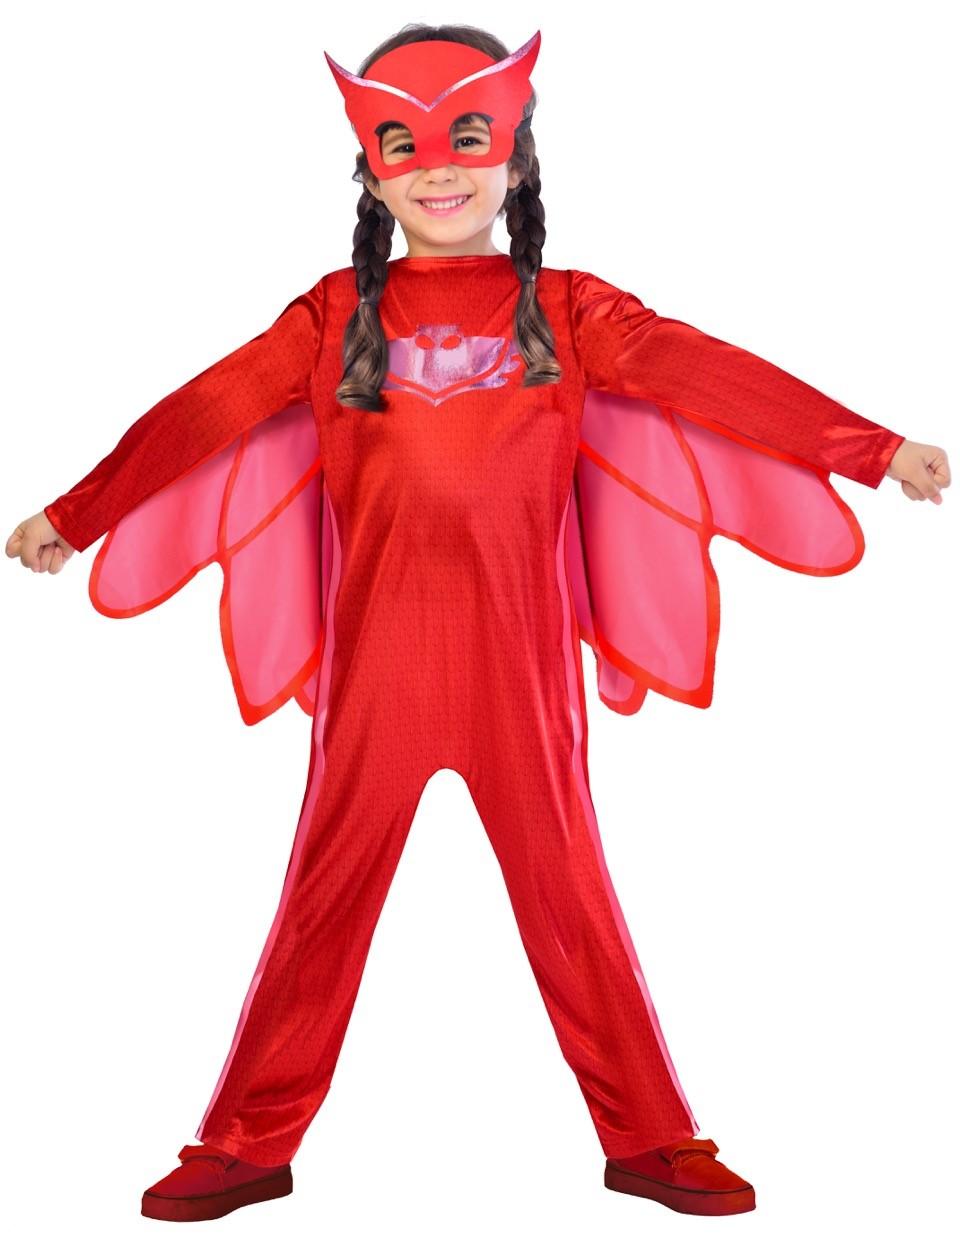 sentinel pj masks kids fancy dress animal superhero book day childrens halloween costumes